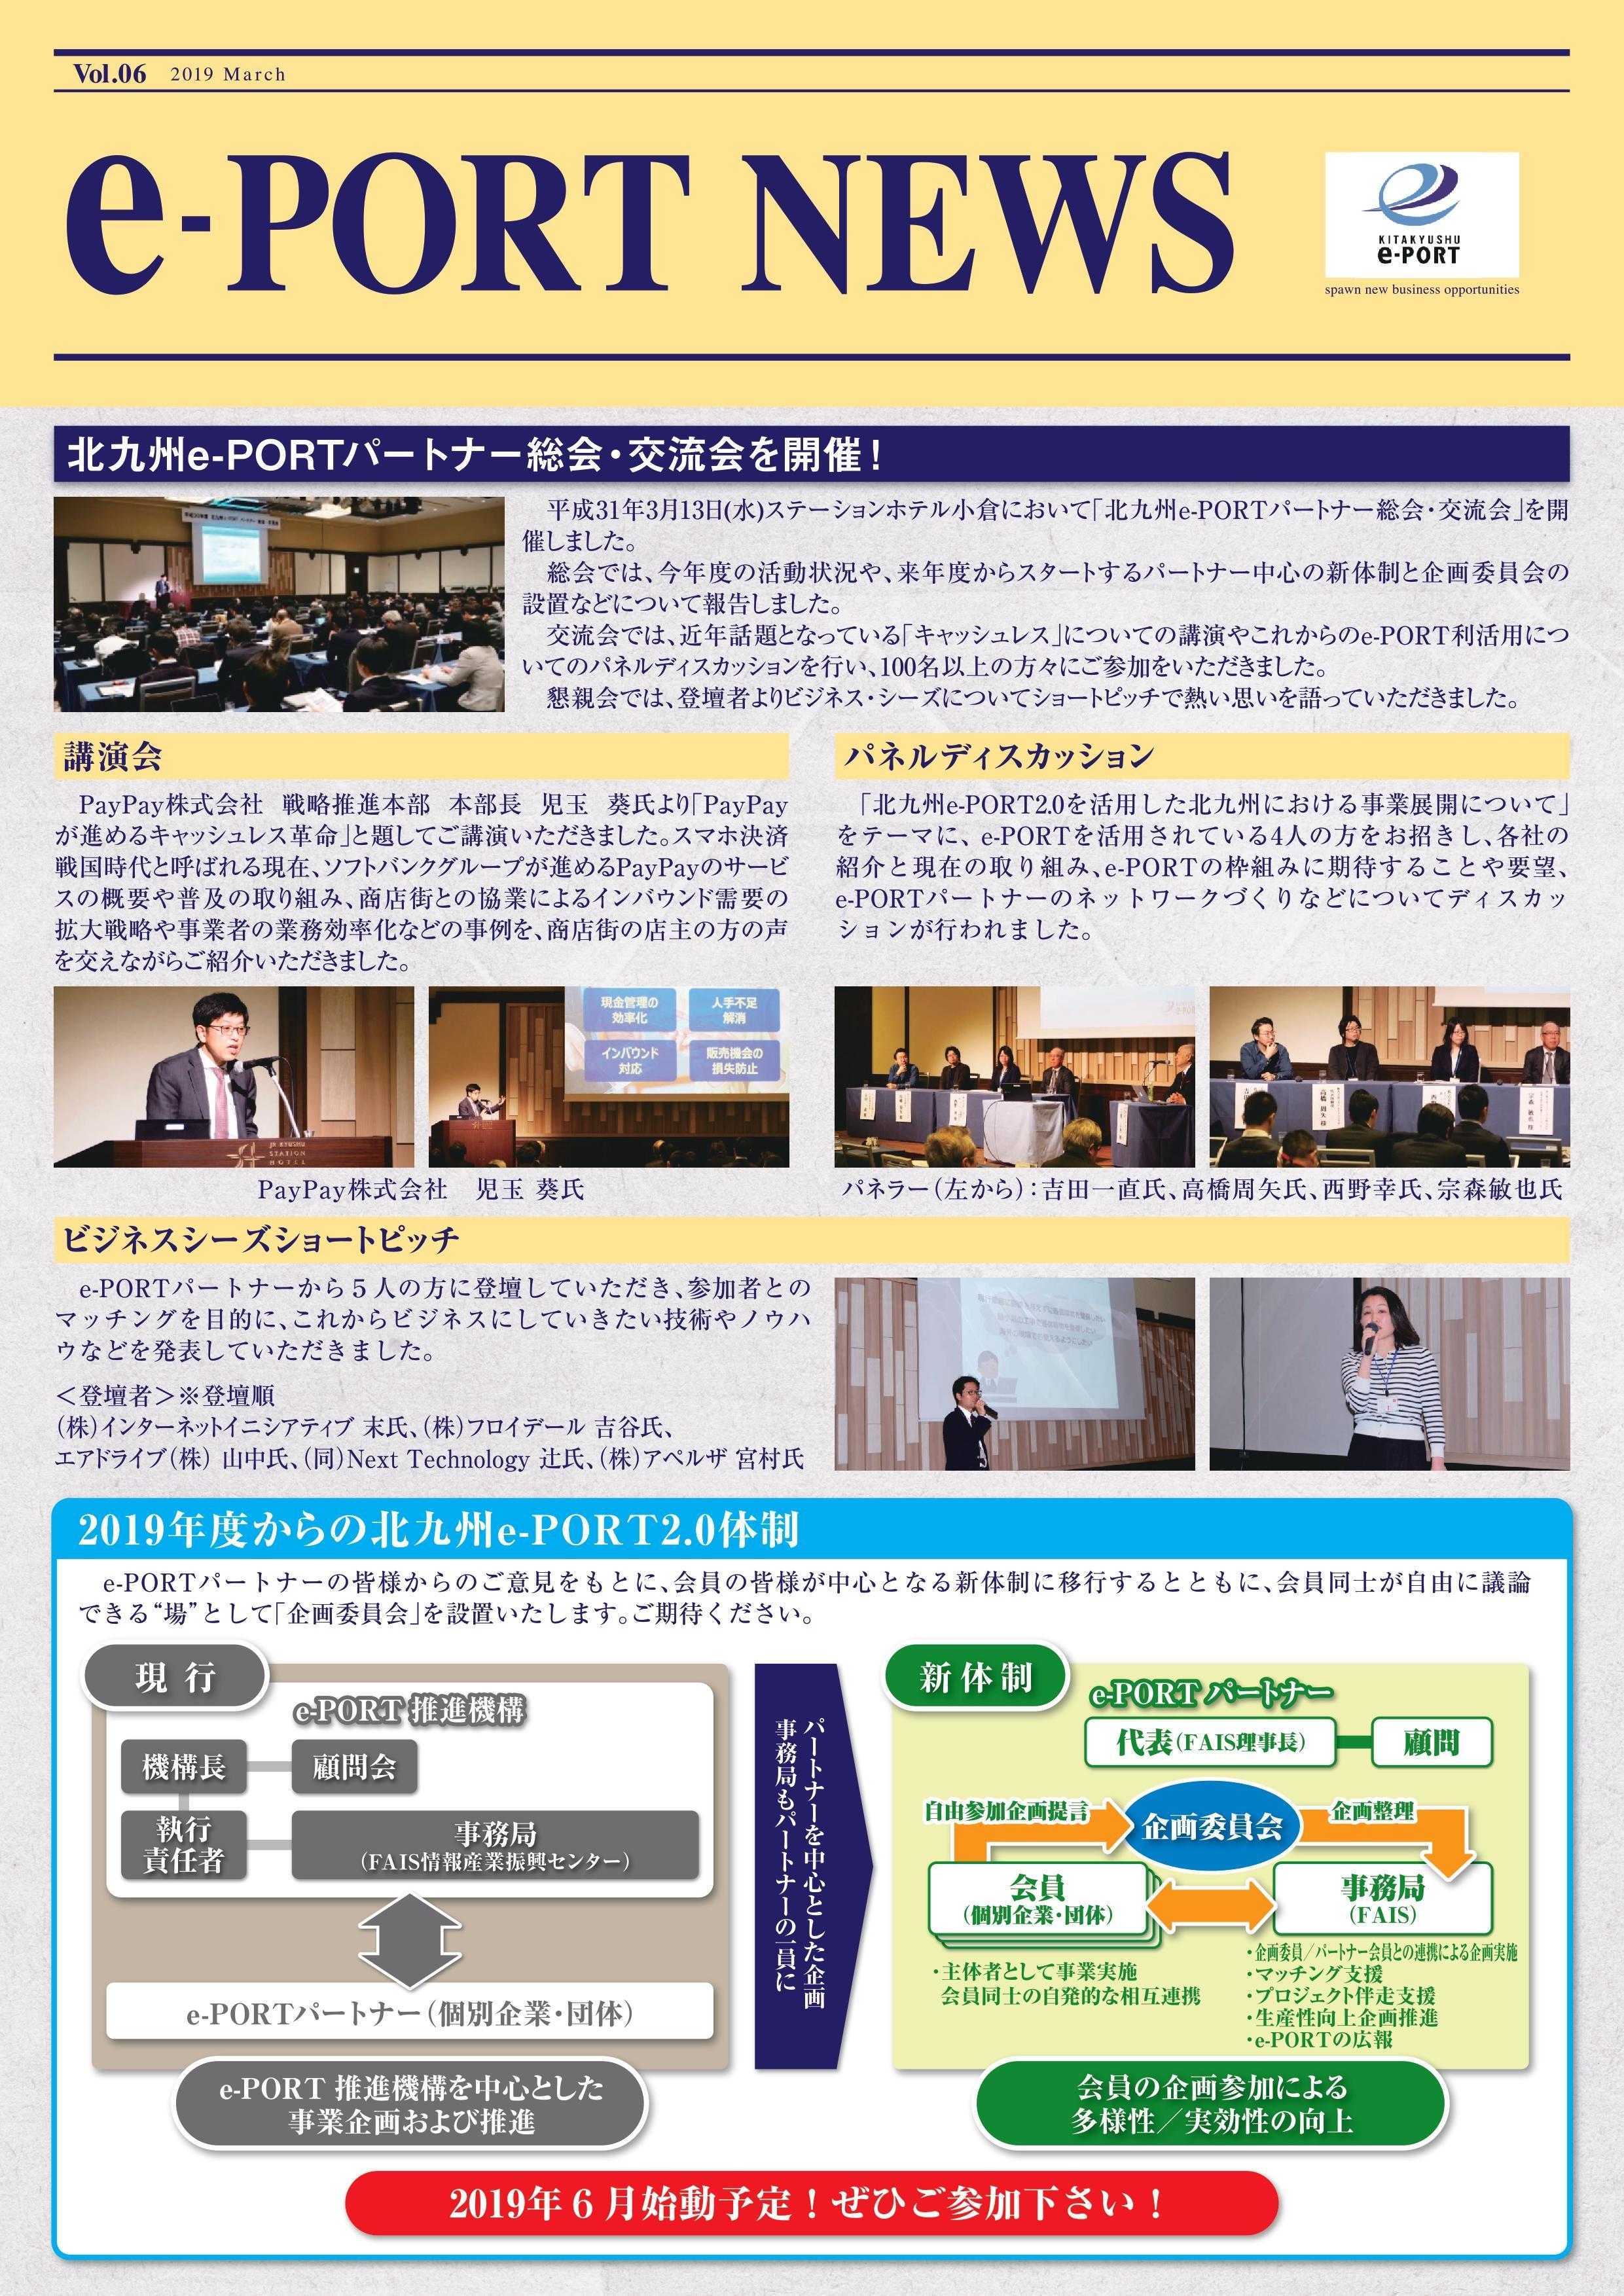 http://www.ksrp.or.jp/fais/iips/topics/0001_5.jpg